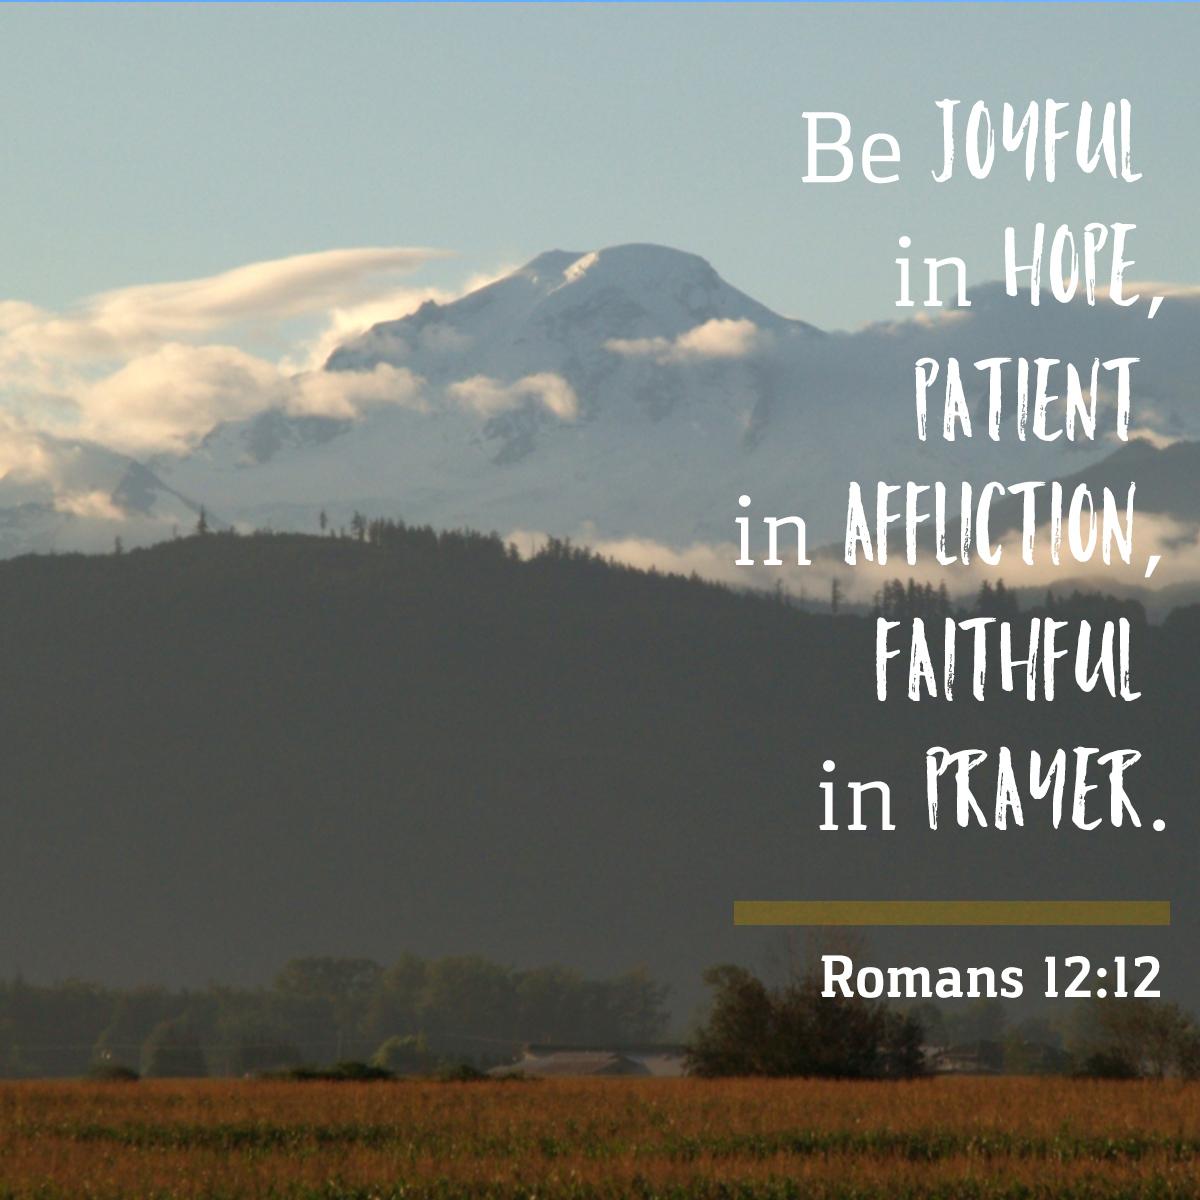 Daily Verse - Romans 12:12